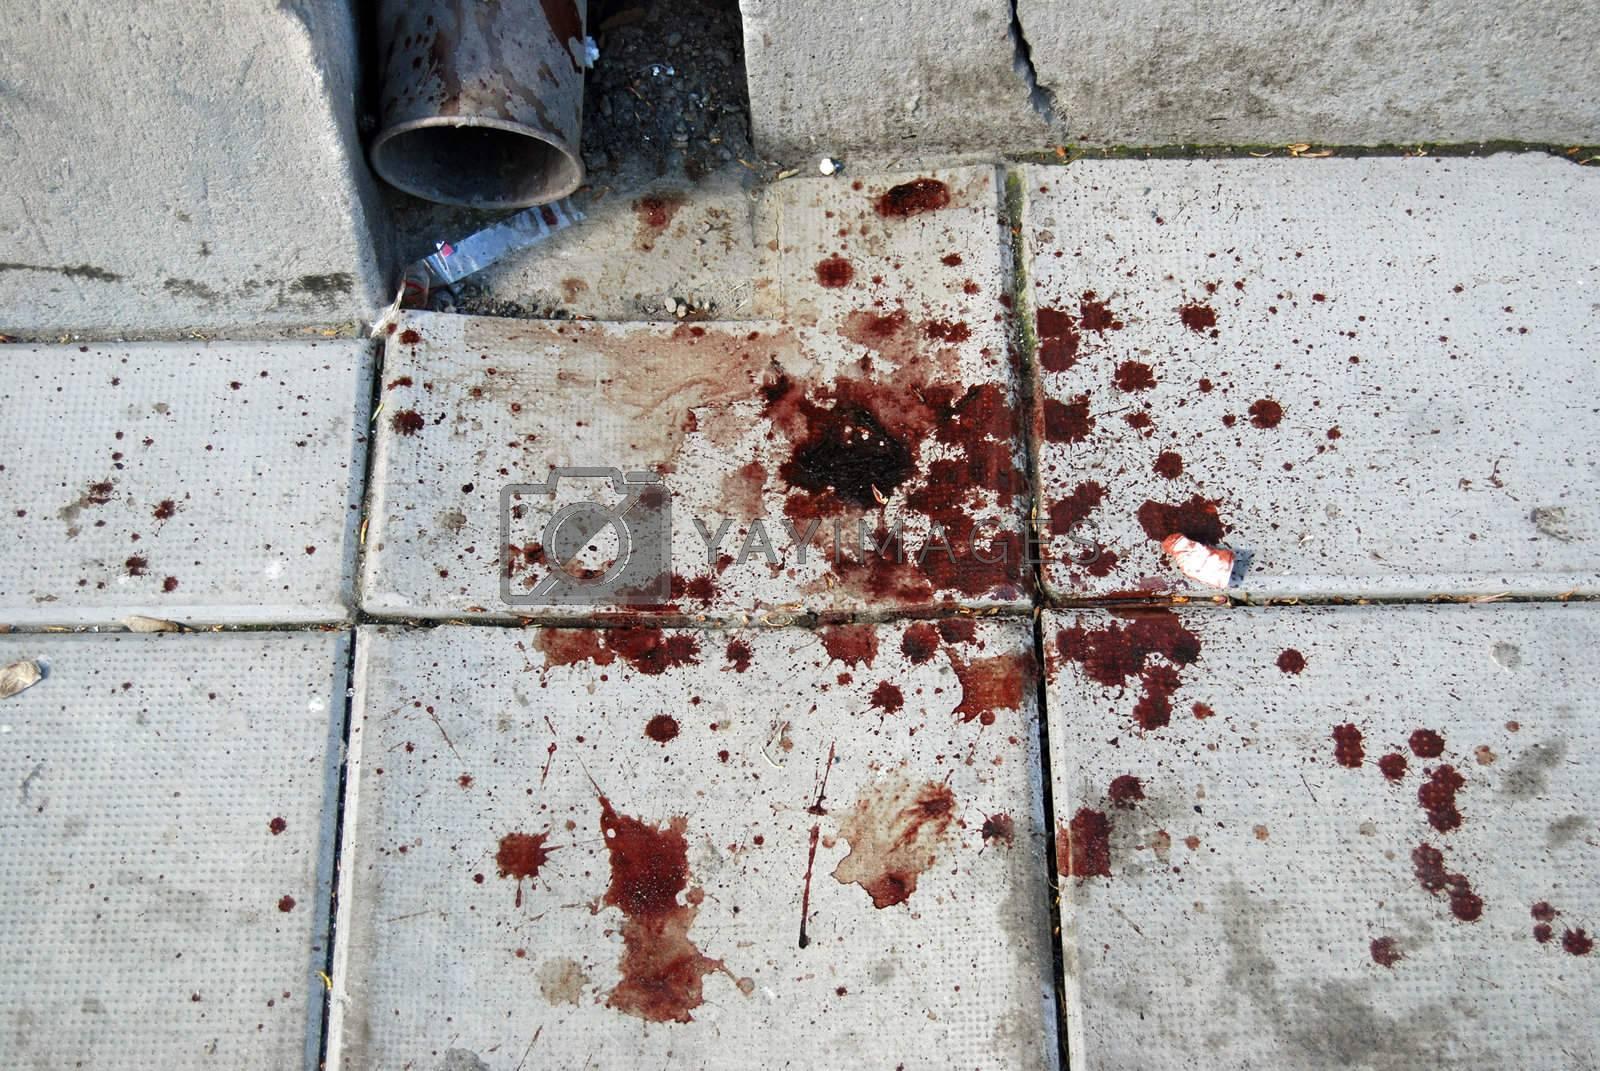 Destructive street violence